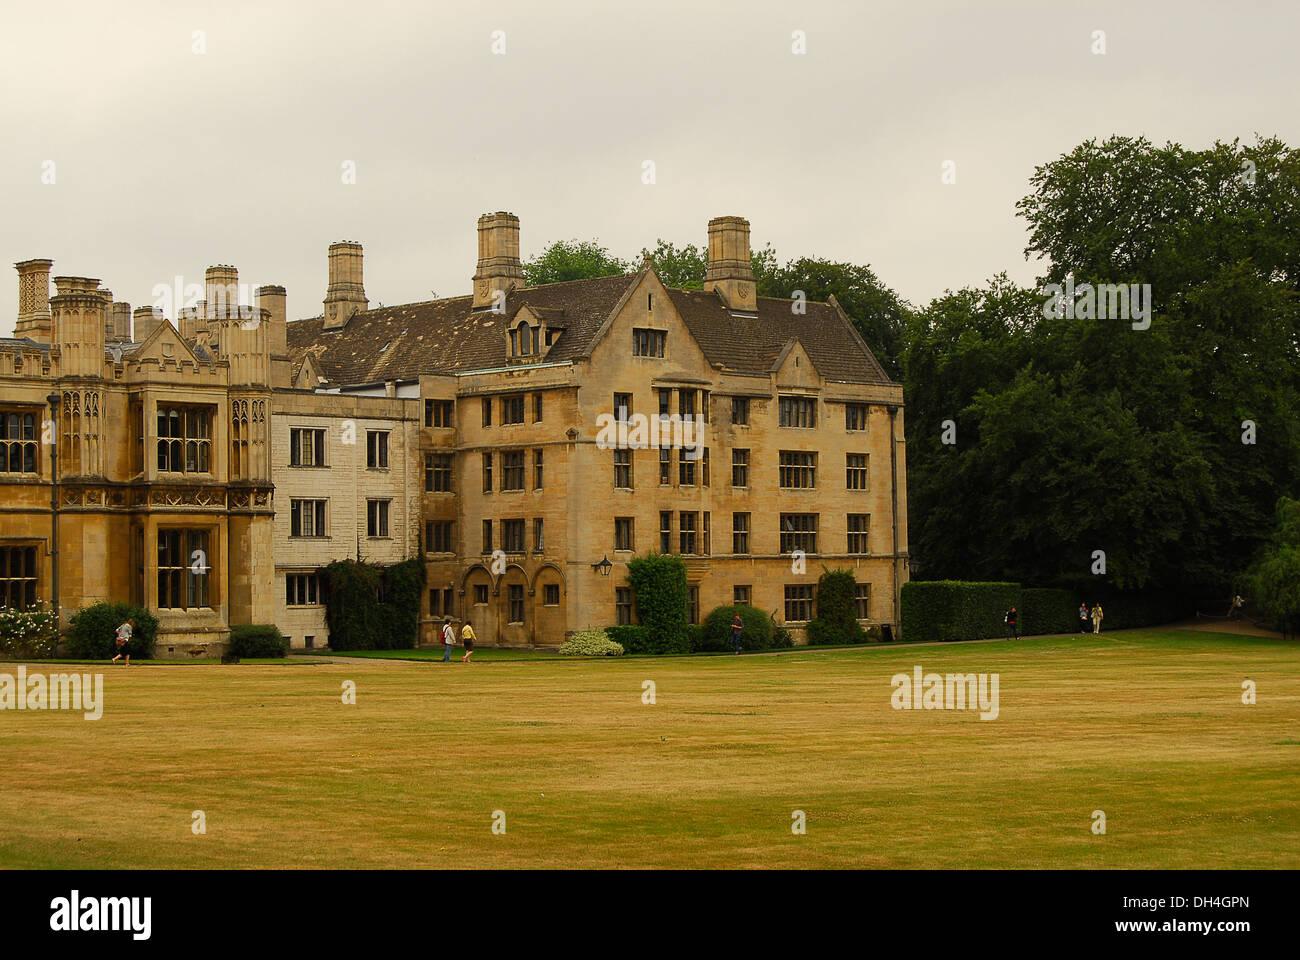 Residencia de estudiantes en Cambridge, Reino Unido,Academia,académico - Stock Image